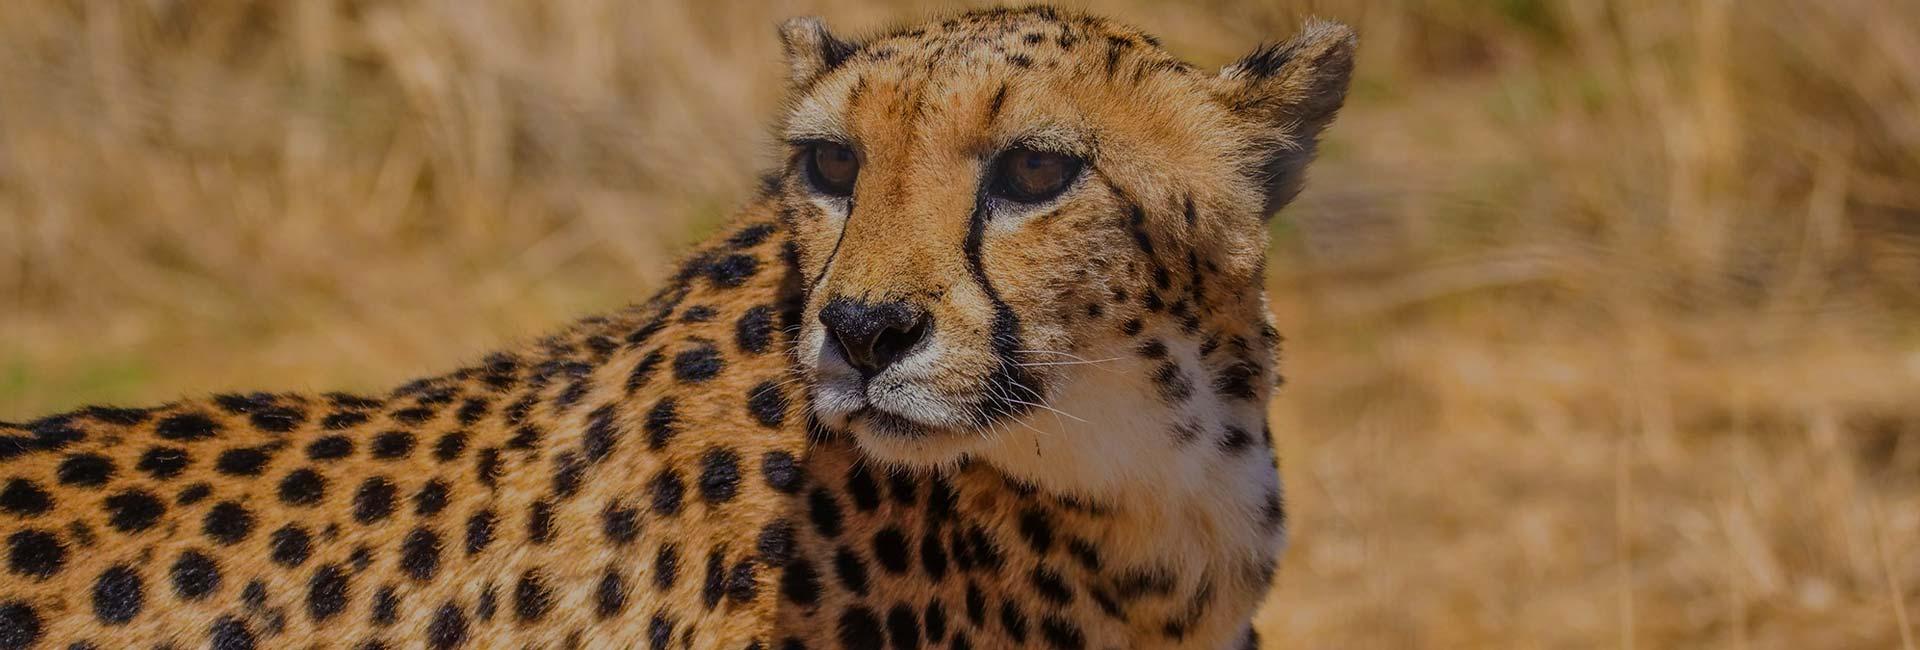 N/a'an Ku Se Wildlife Sanctuary